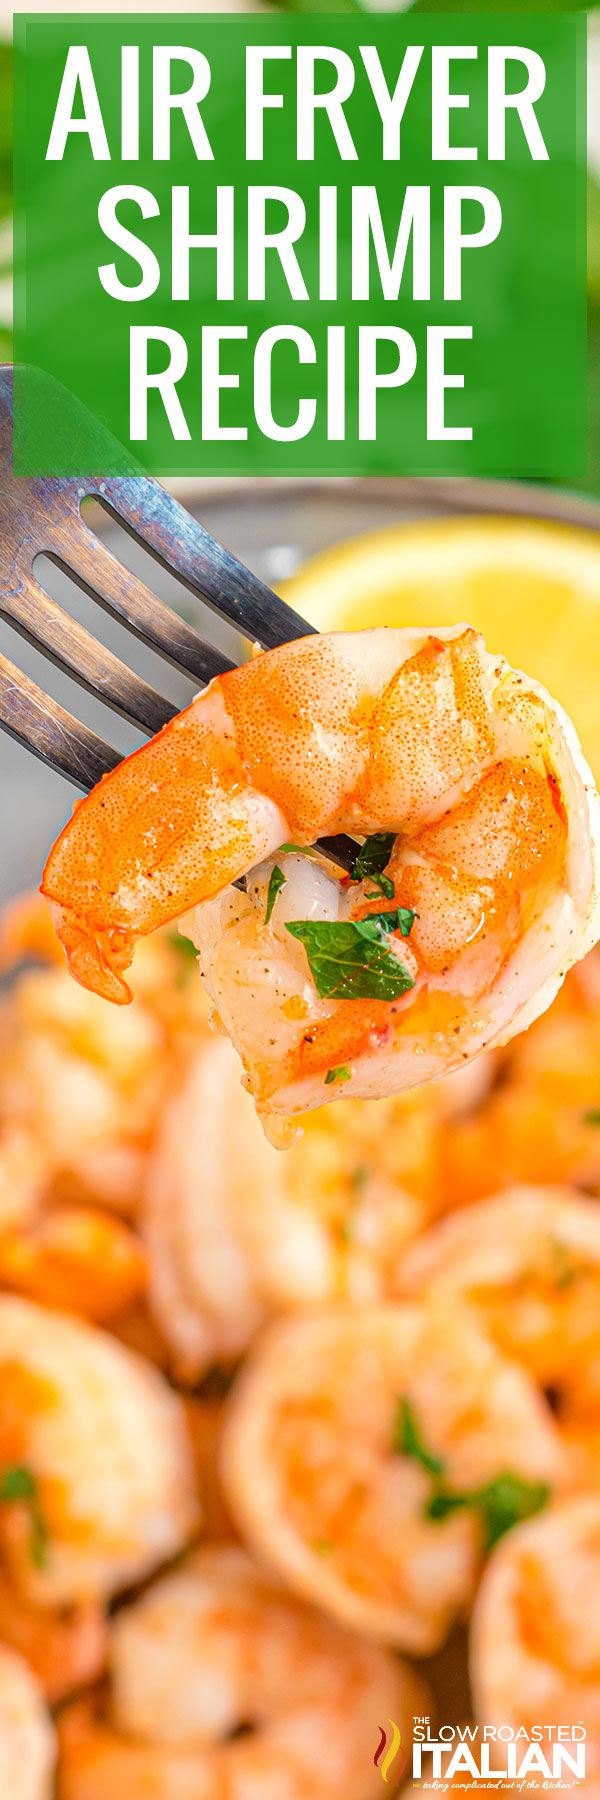 air fryer shrimp closeup